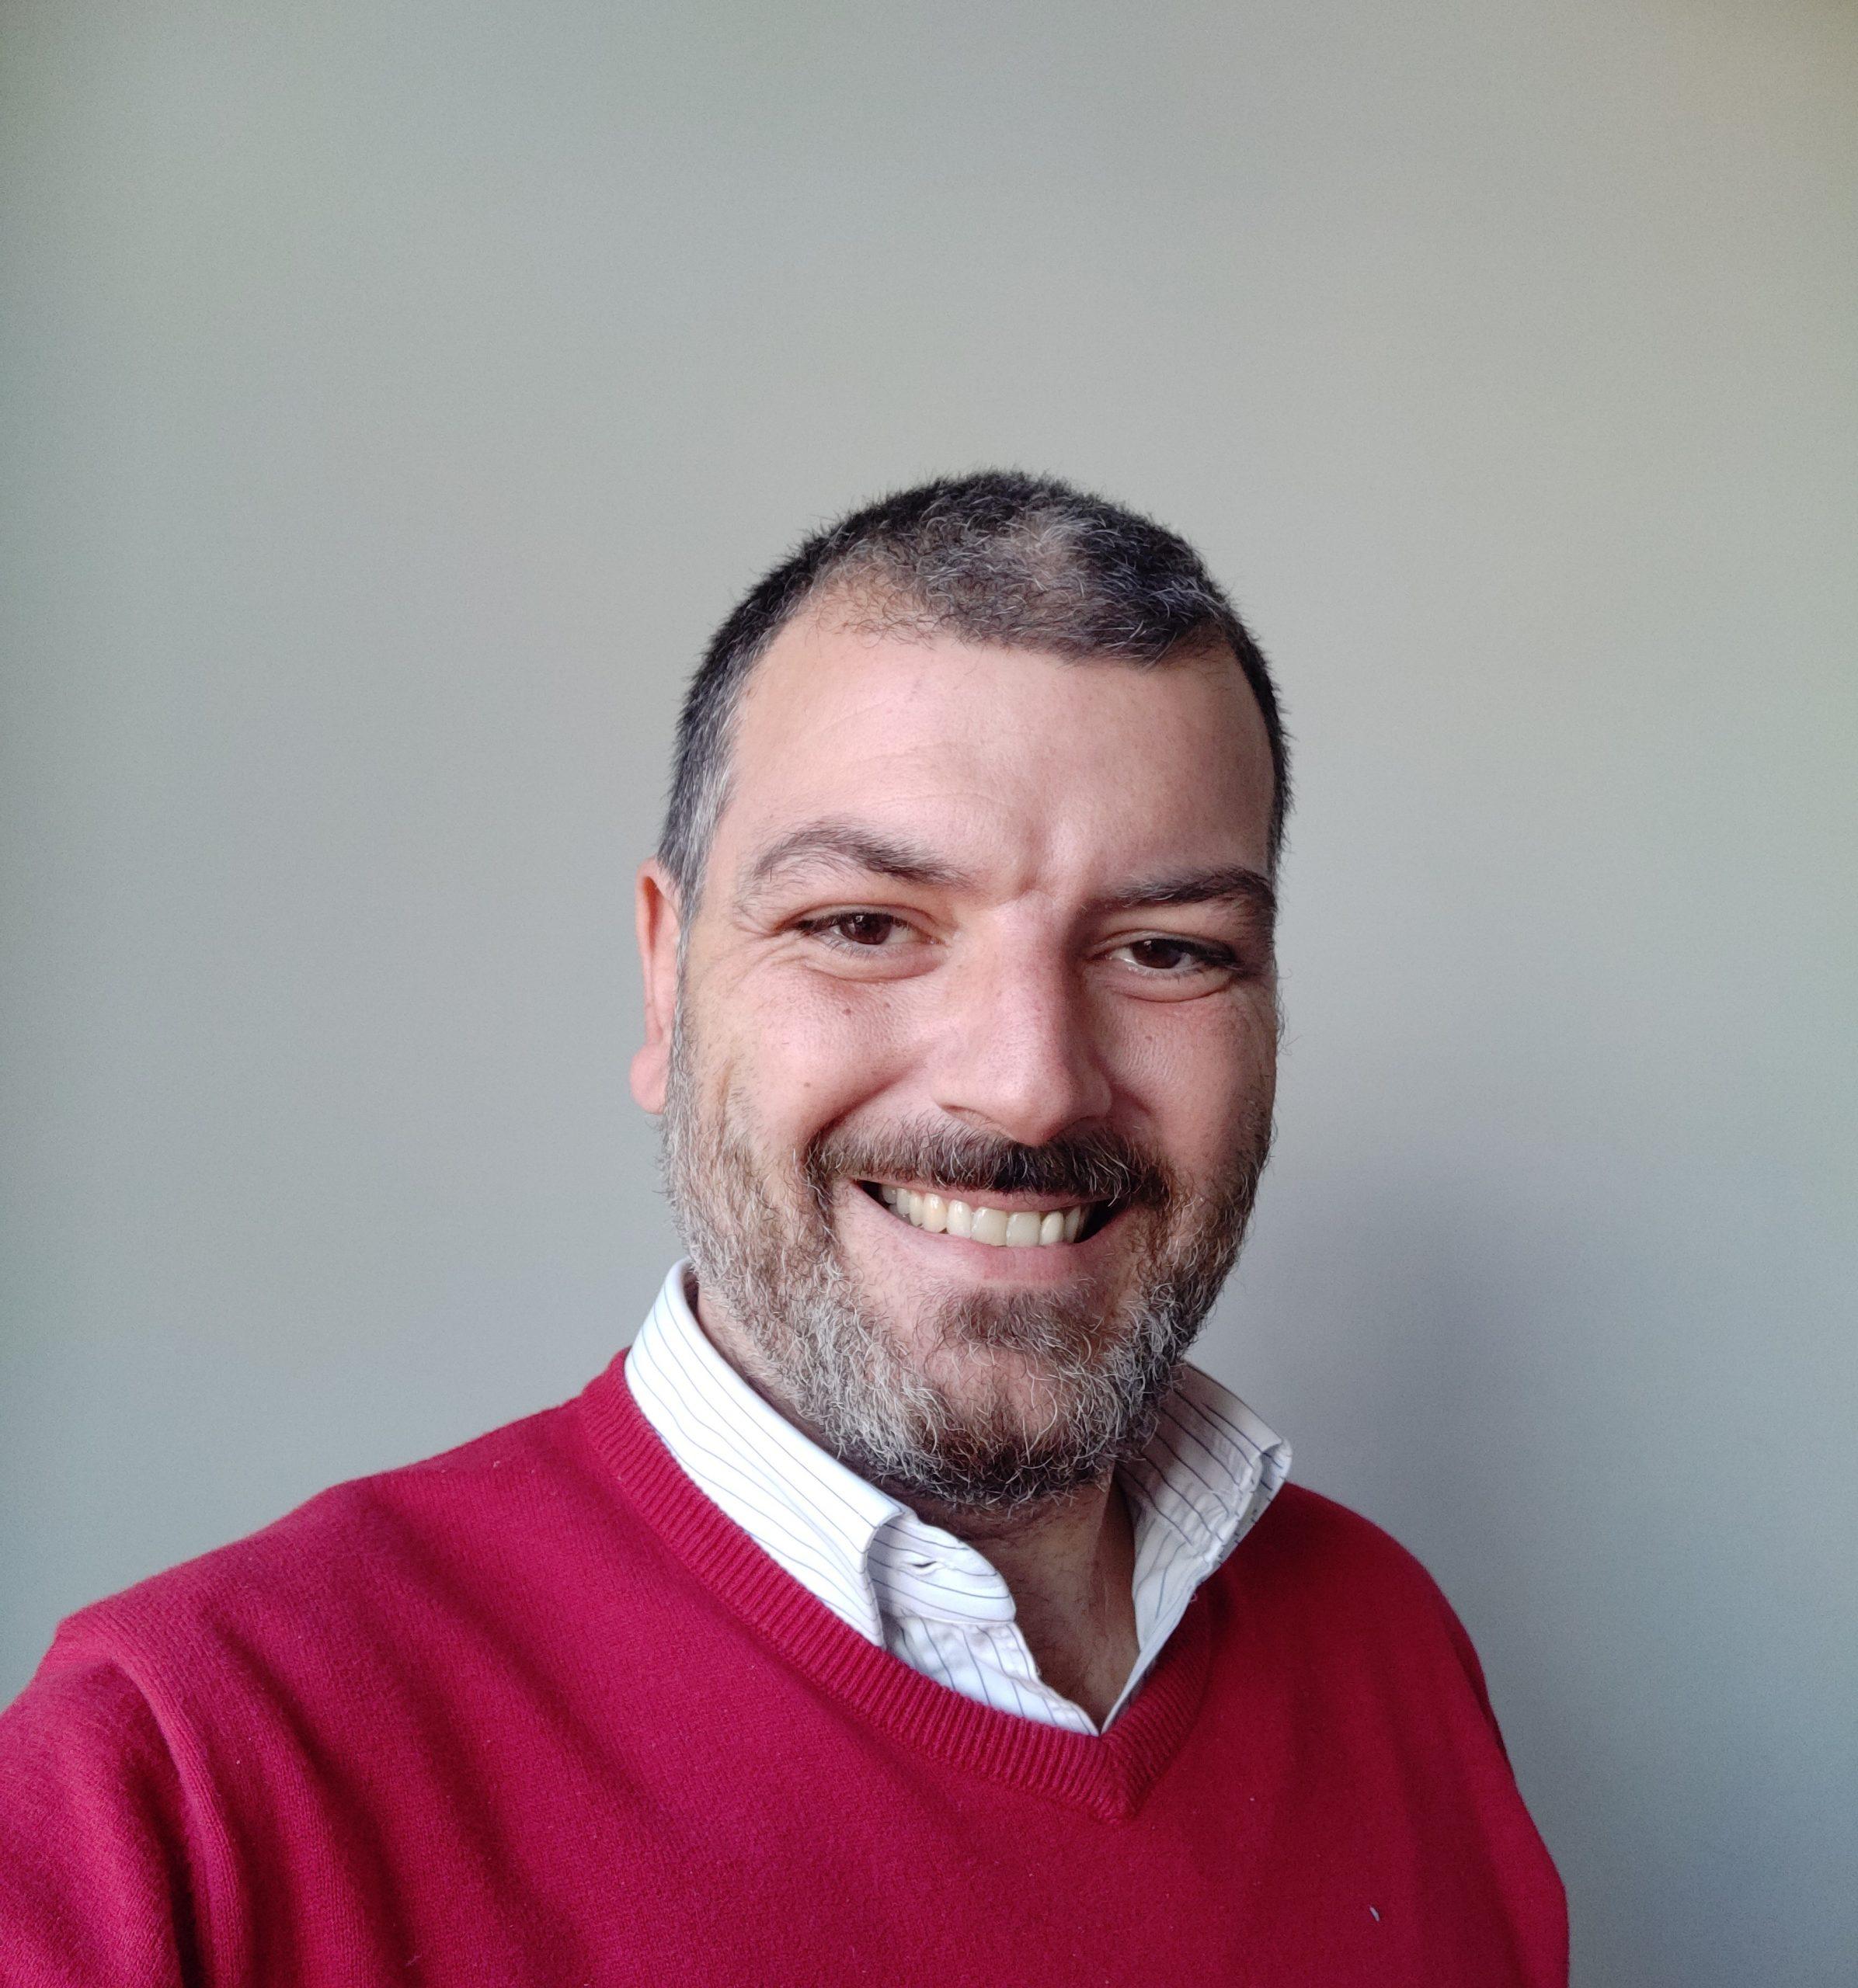 Valerio-Brai-Braintech-Voxloud-2-scaled